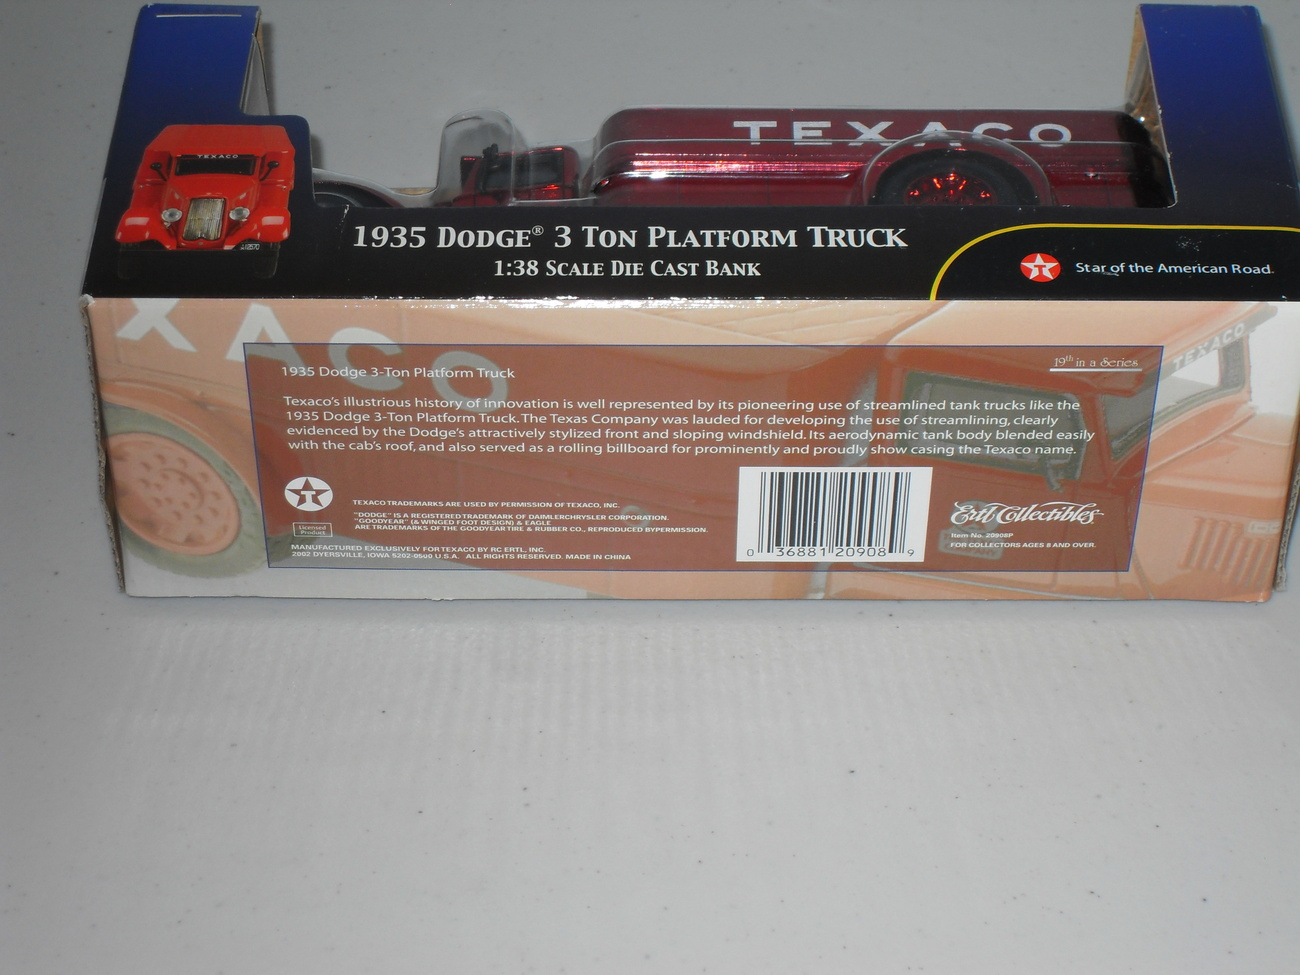 2002 ERTL Texaco 1935 Dodge 3 Ton Platform Truck 1:38 Scale Die Cast Bank New